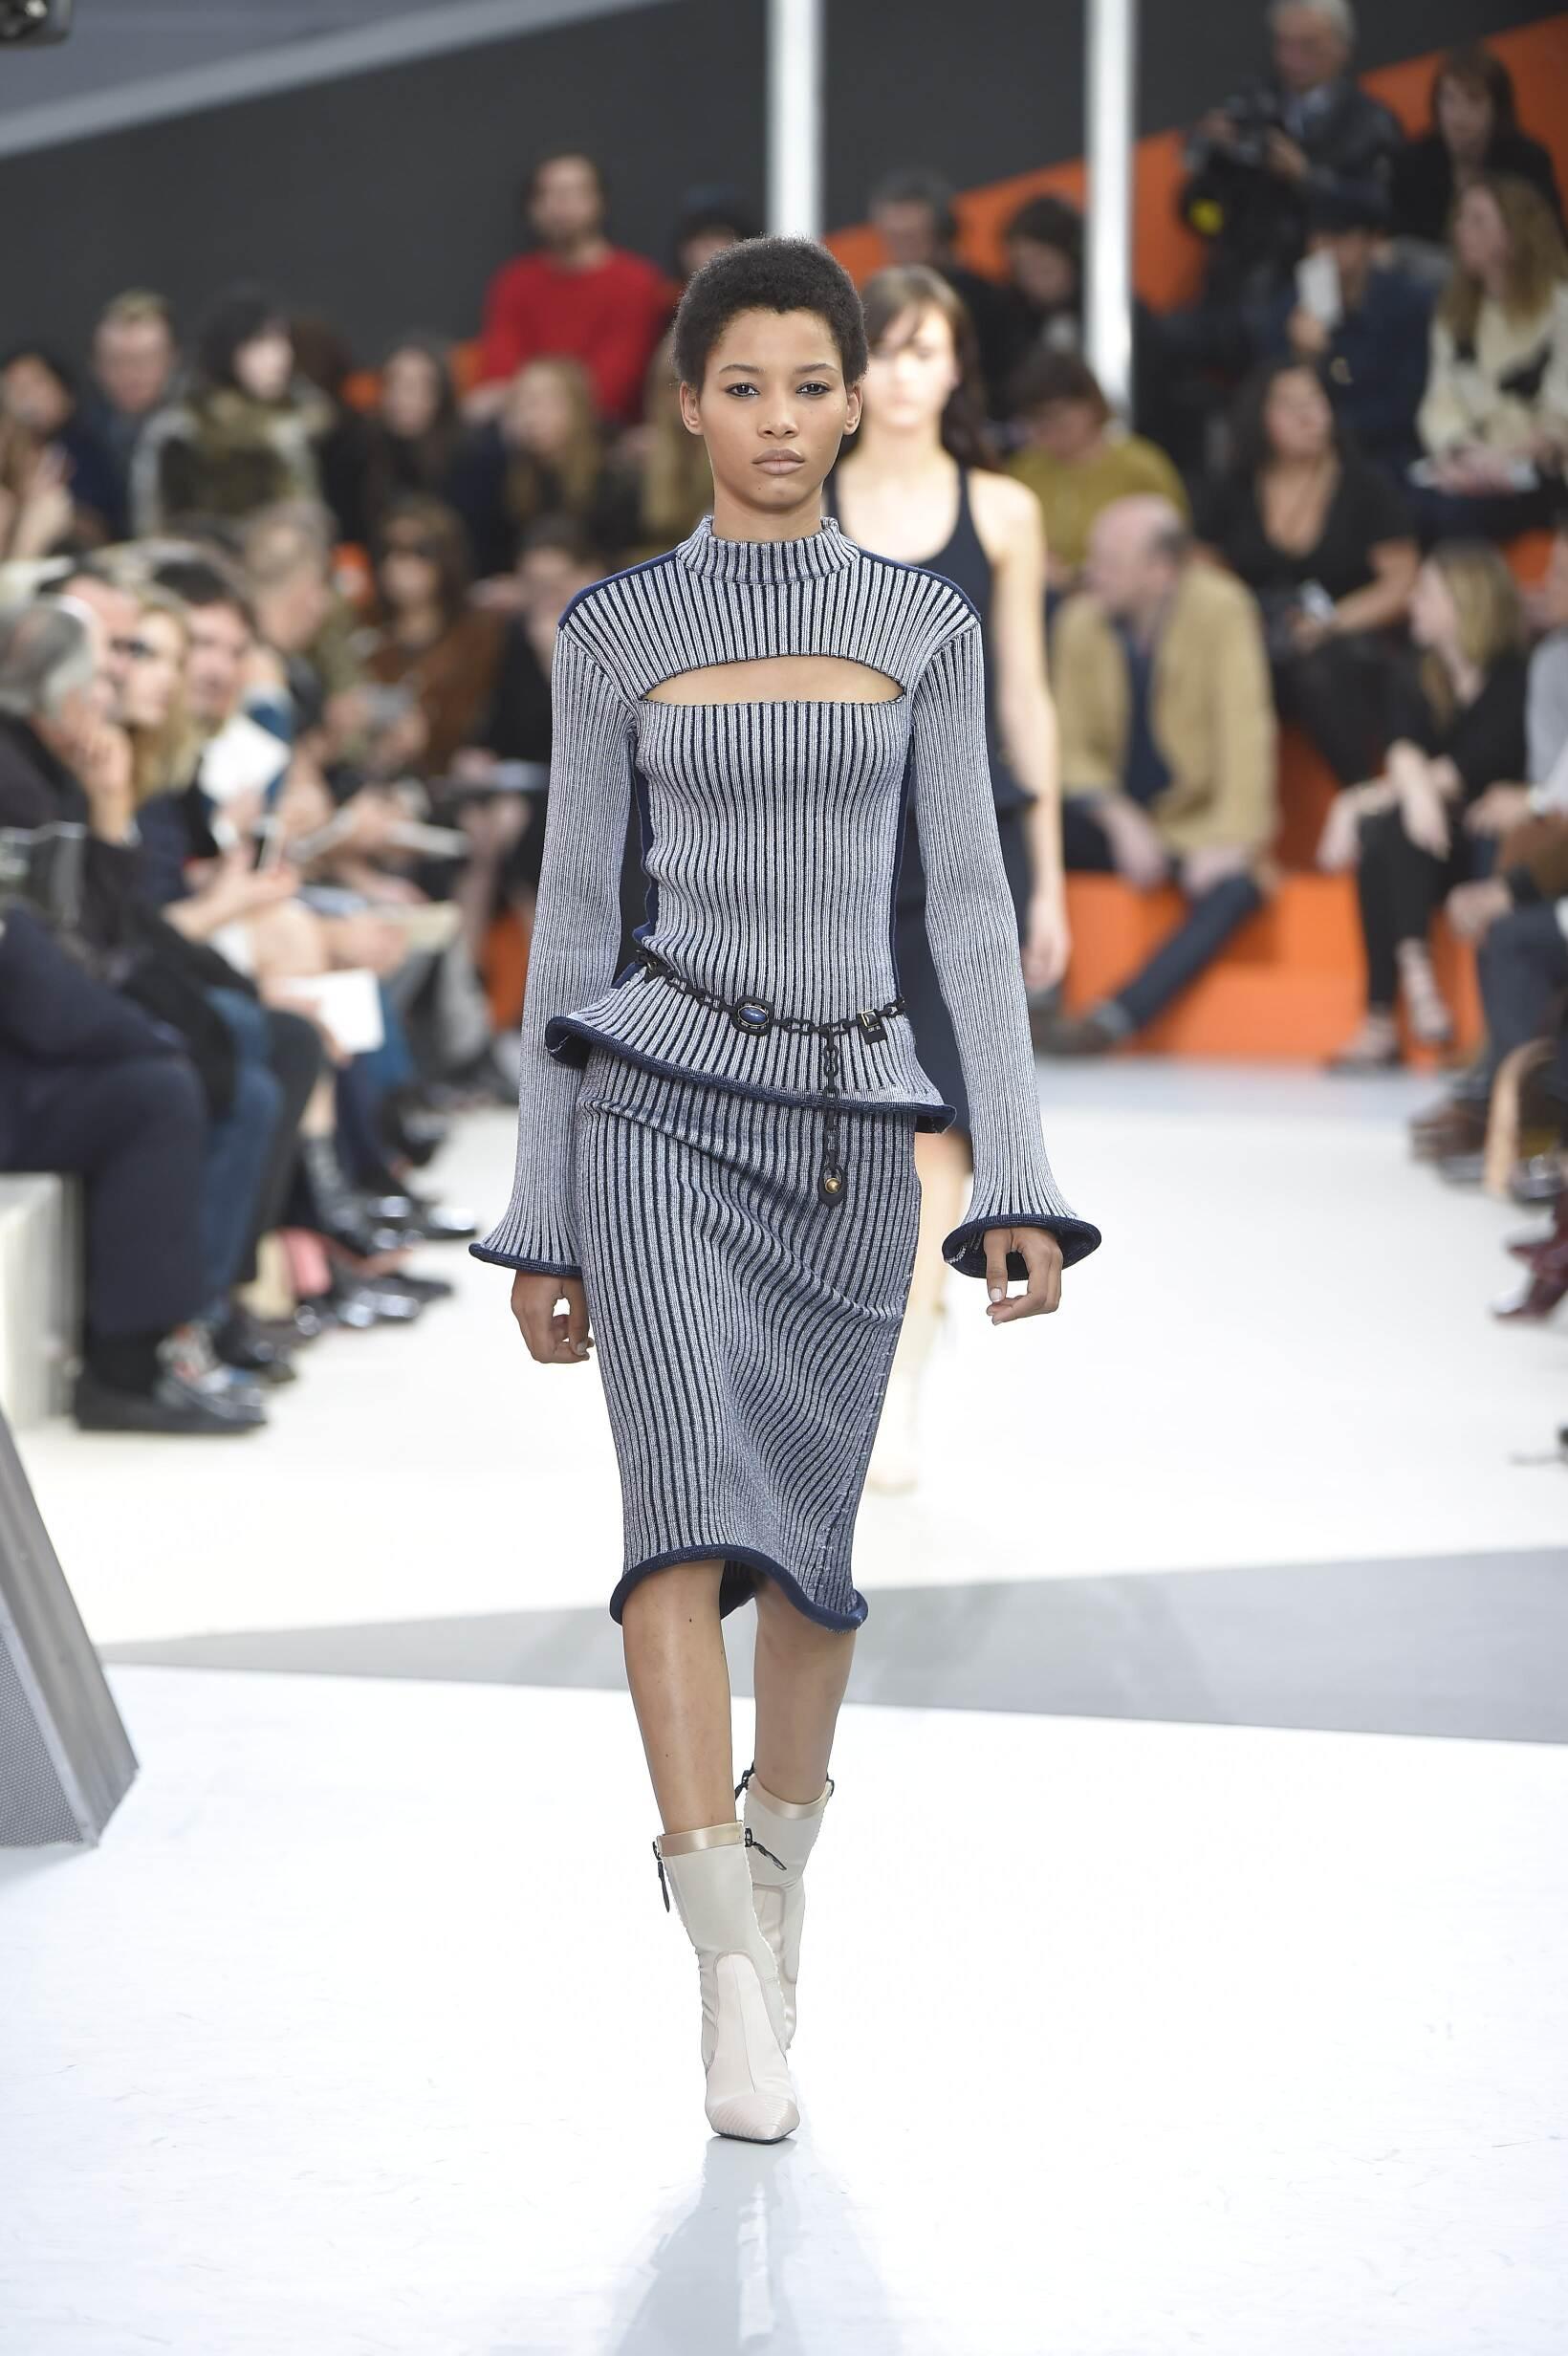 2016 Fall Fashion Woman Louis Vuitton Collection